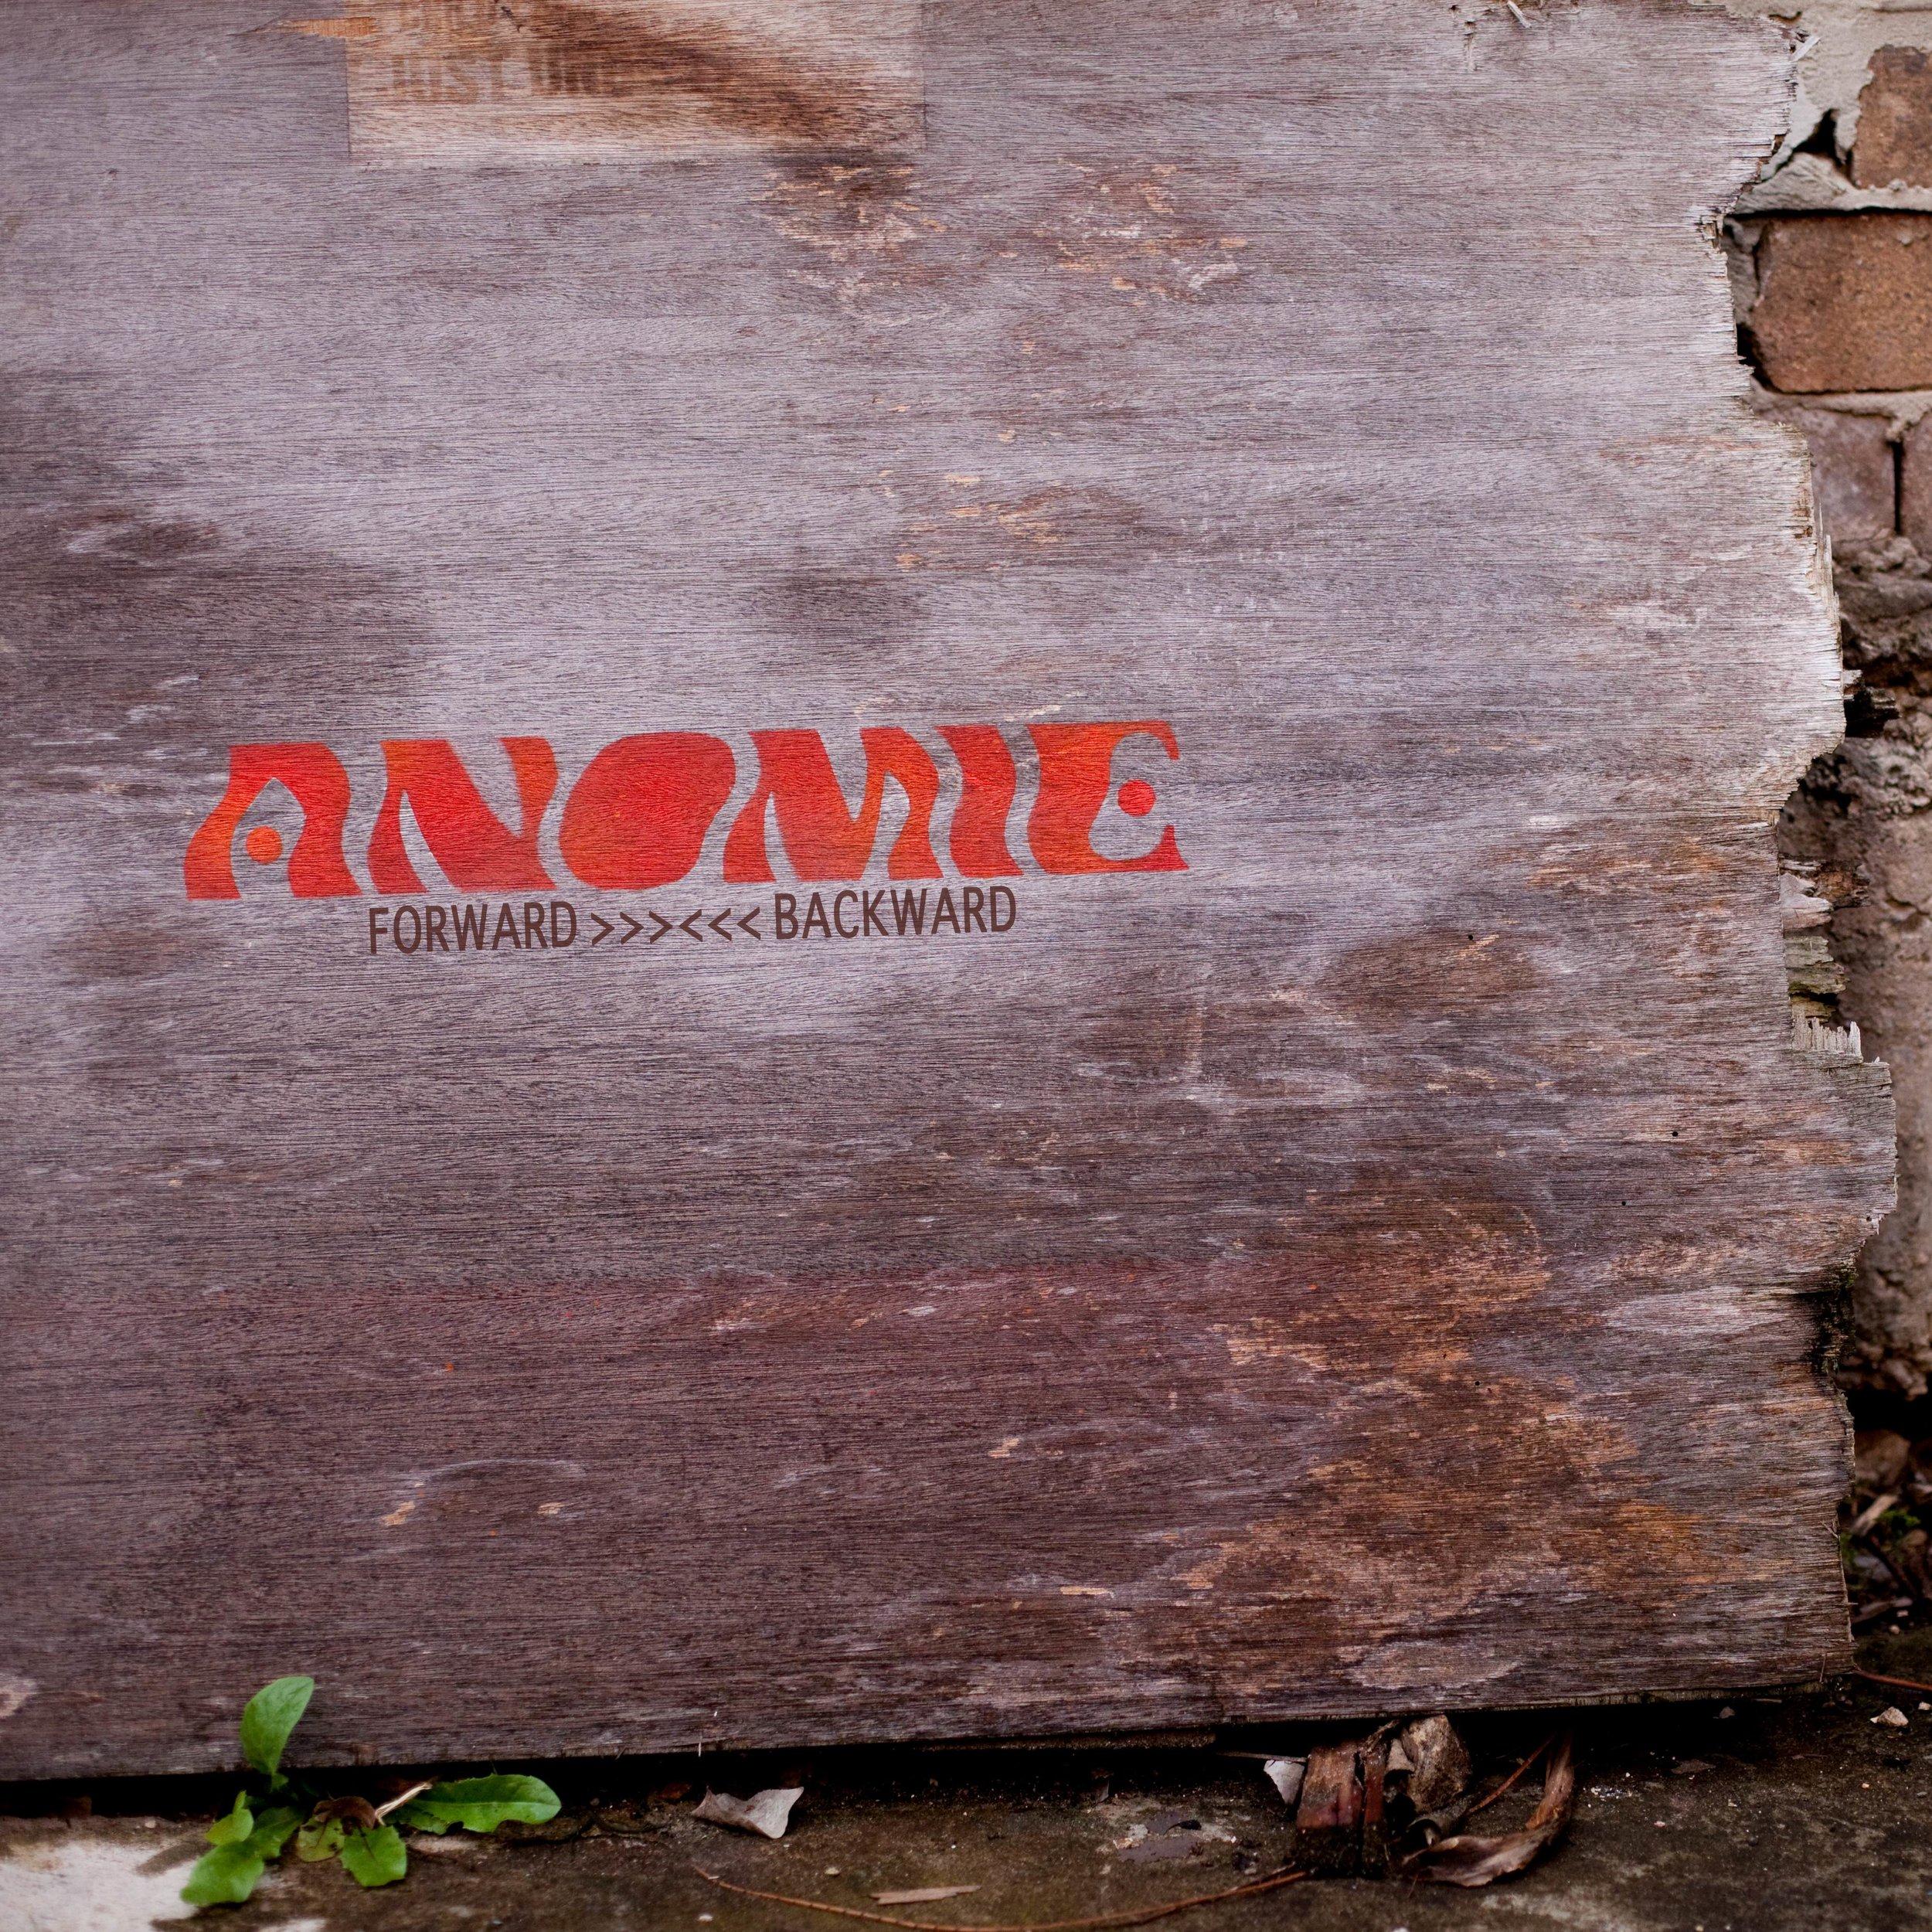 Anomie - Forward>>><<<Backward